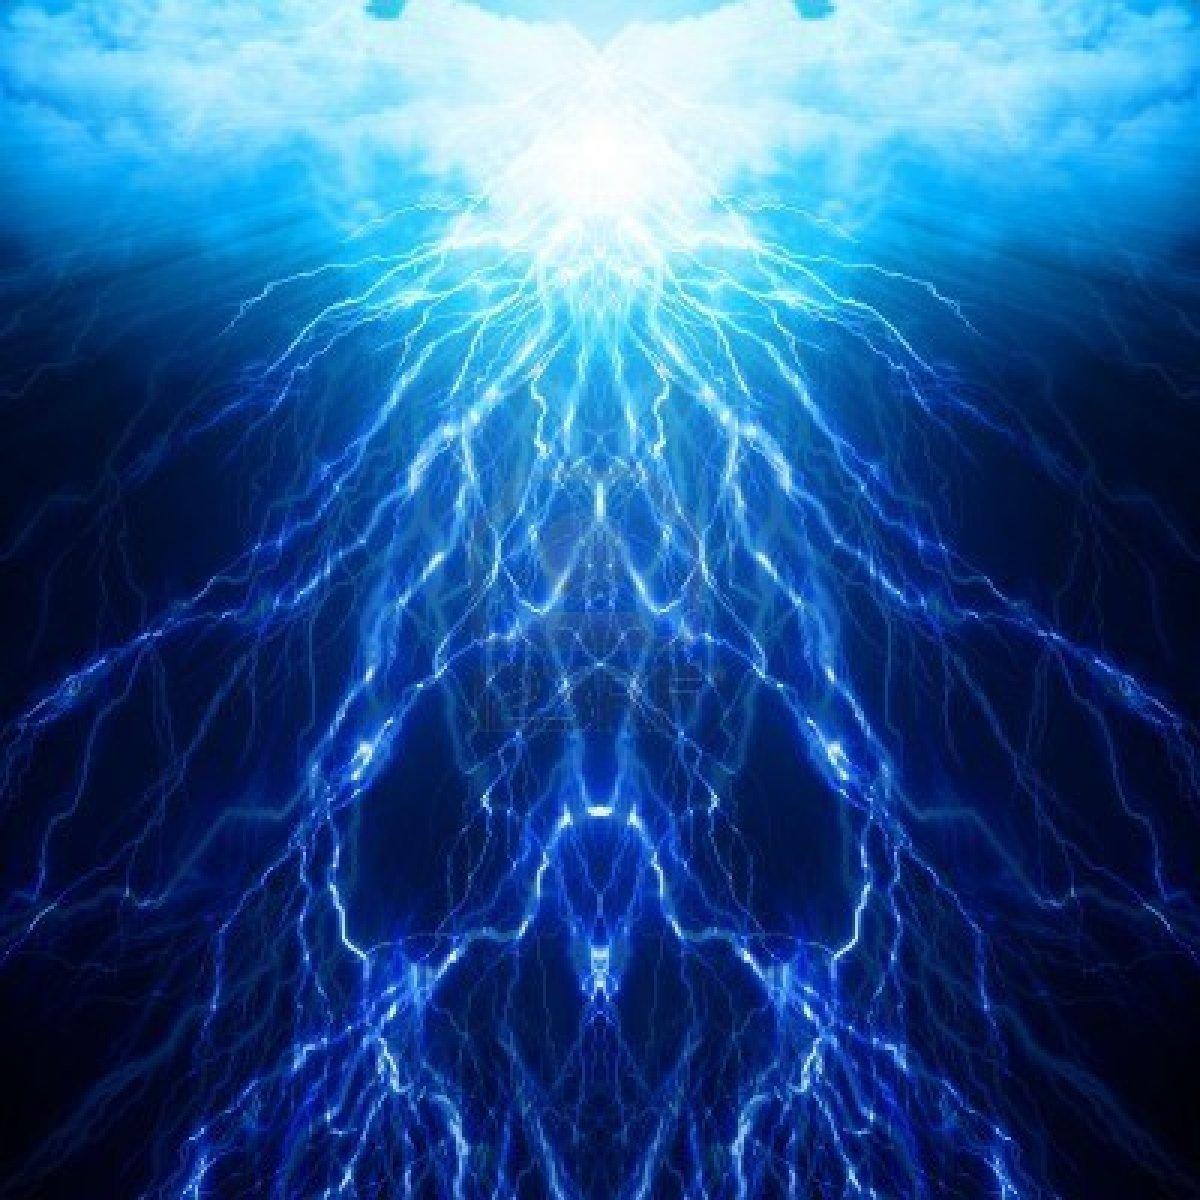 Blue Lightning Backgrounds   HD Wallpapers 1200x1200